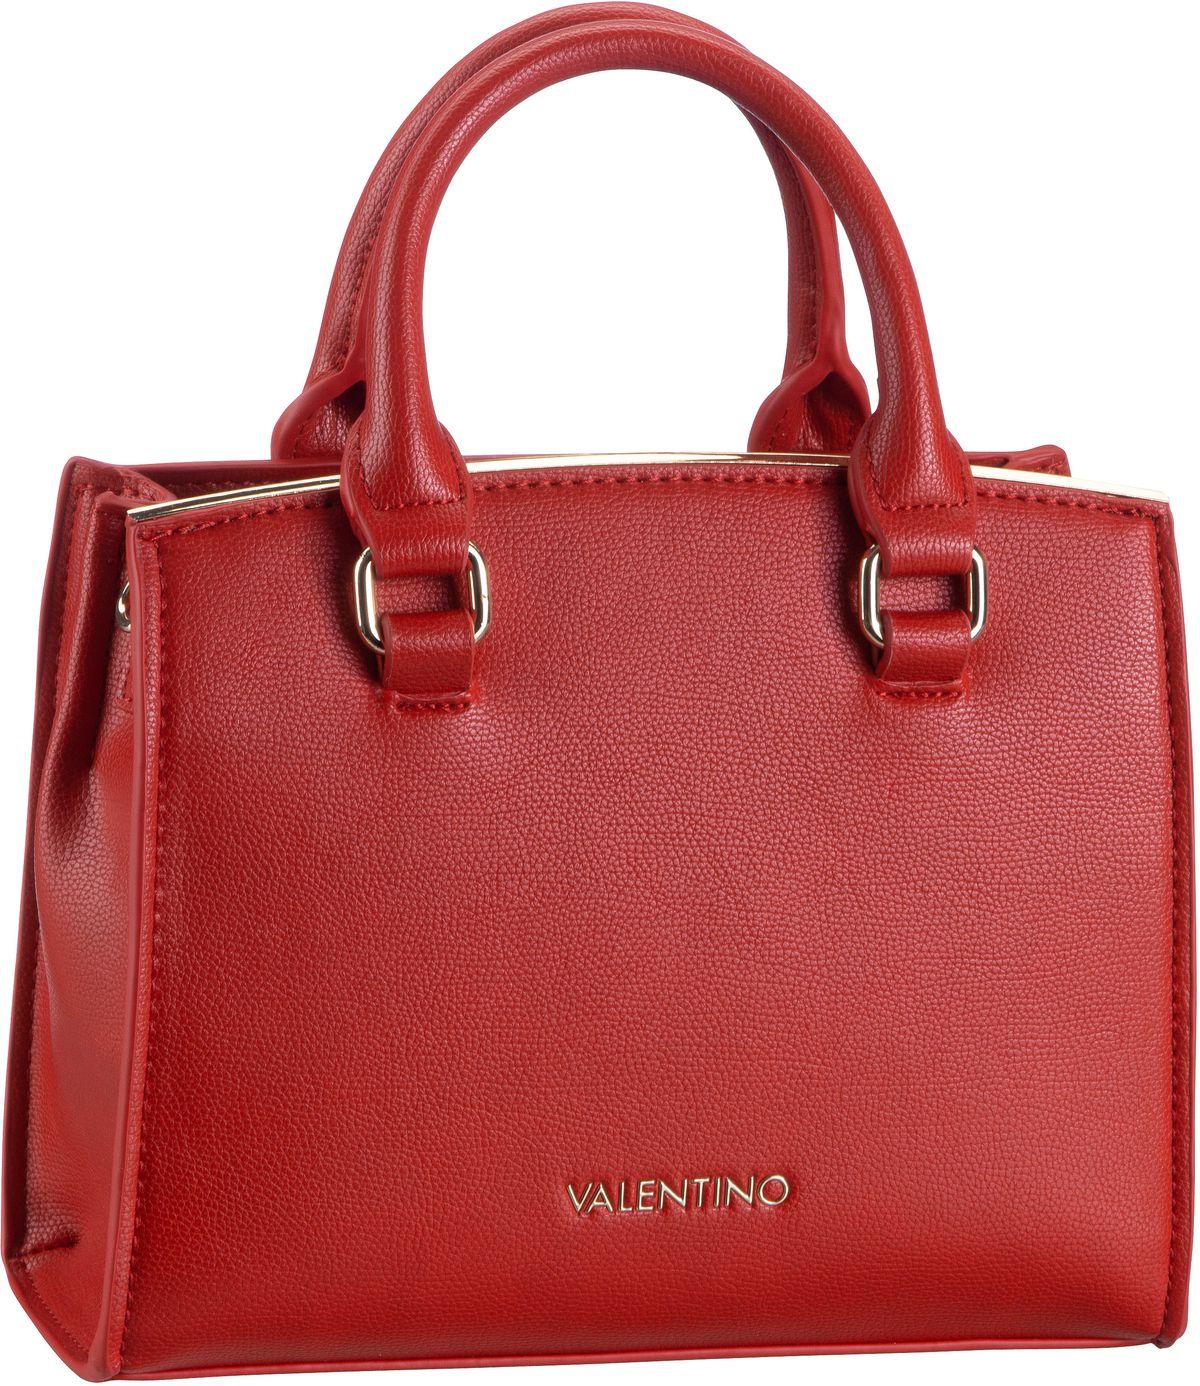 Bags Handtasche Unicorno Shopping T02 Rosso